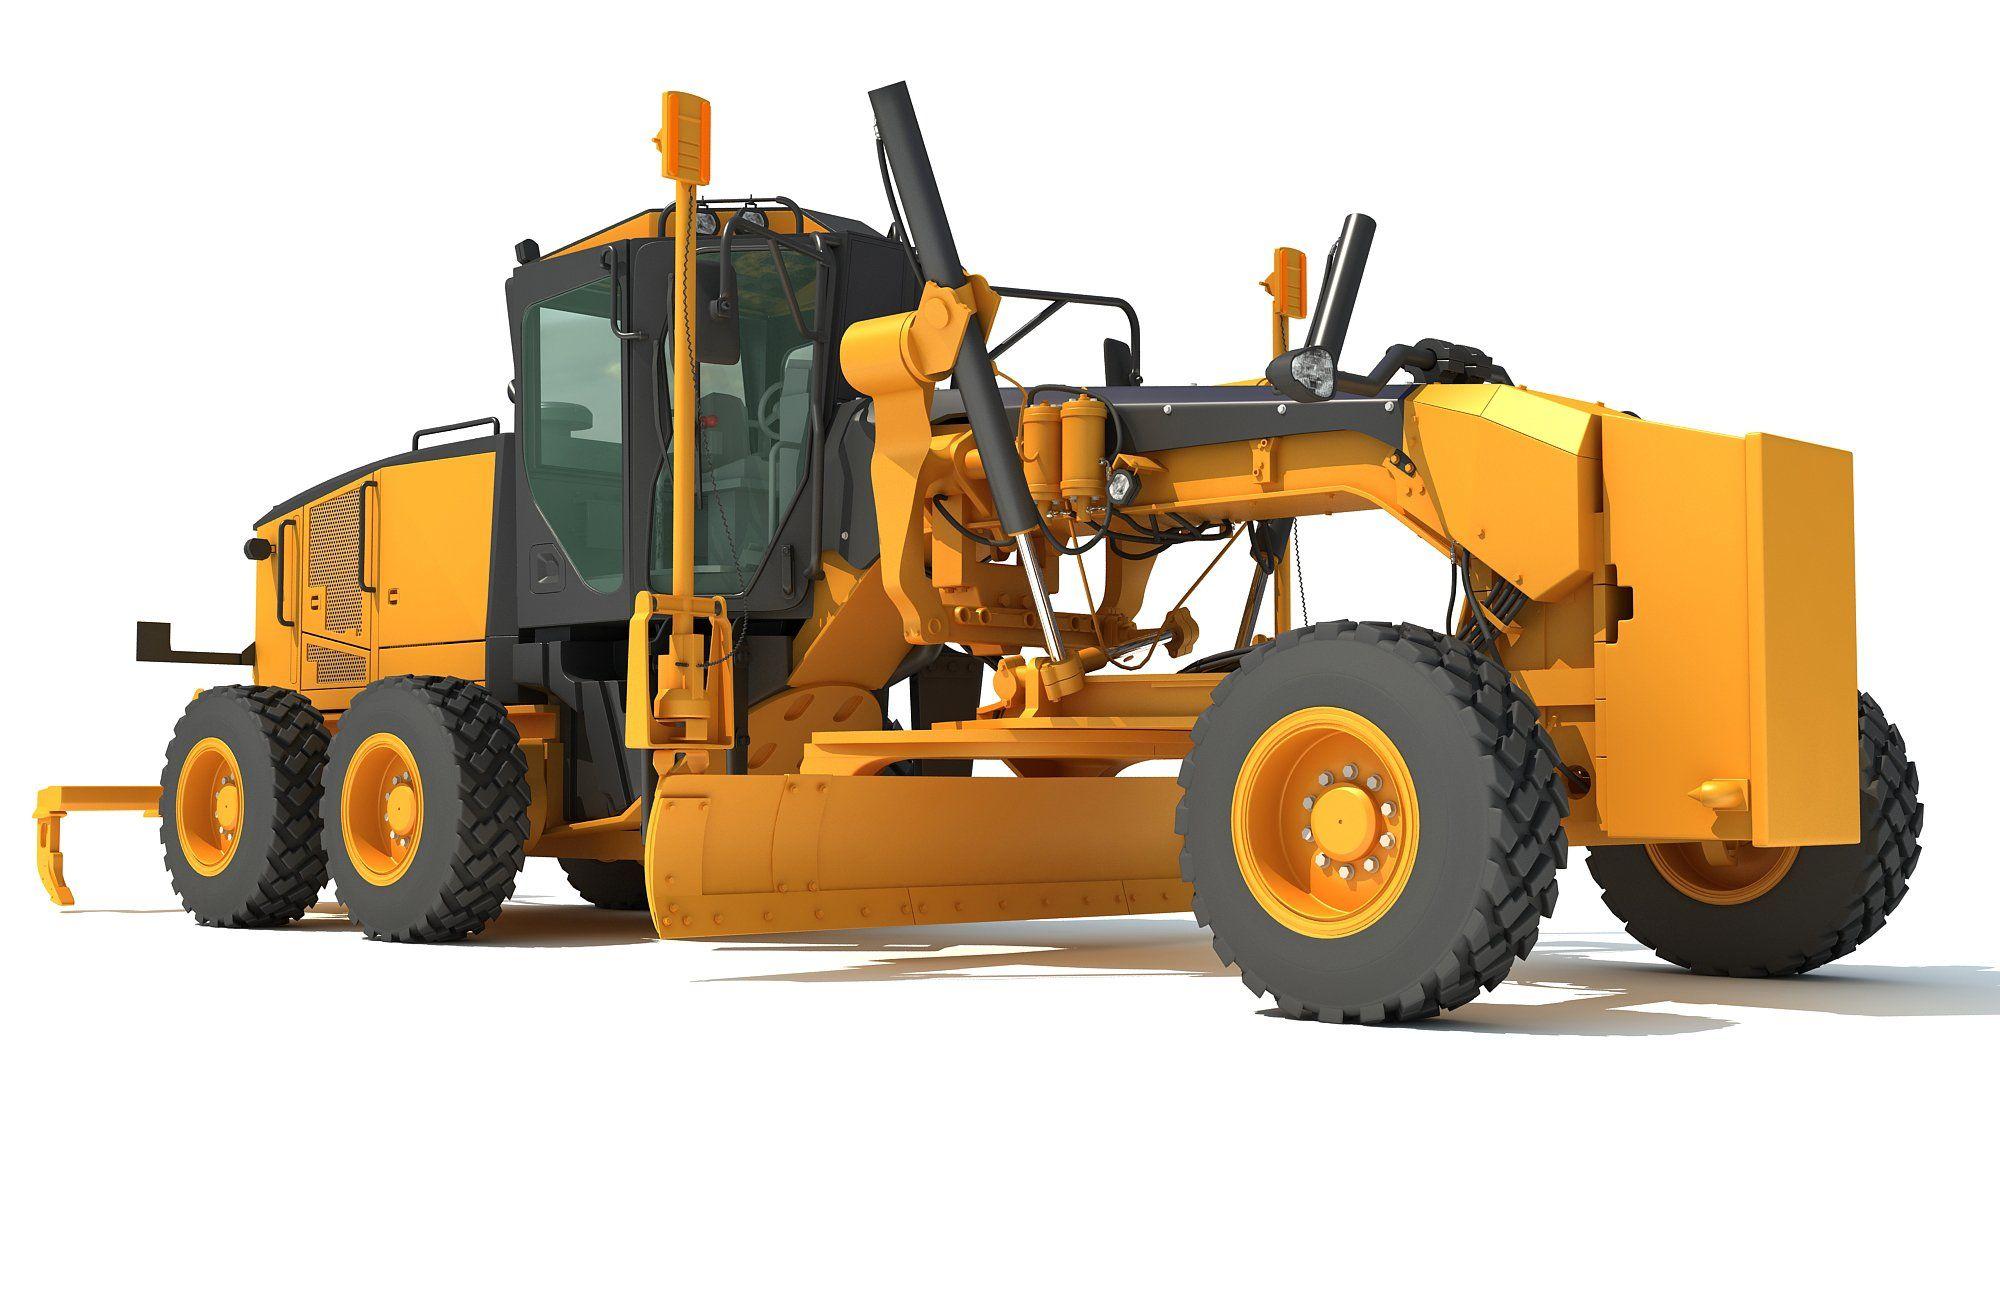 Global Road Graders for Engineering Market 2021 Industry Growth –  Caterpillar, John Deere, CNH Industrial, Komatsu, BEML, Mahindra, Veekmas –  KSU | The Sentinel Newspaper